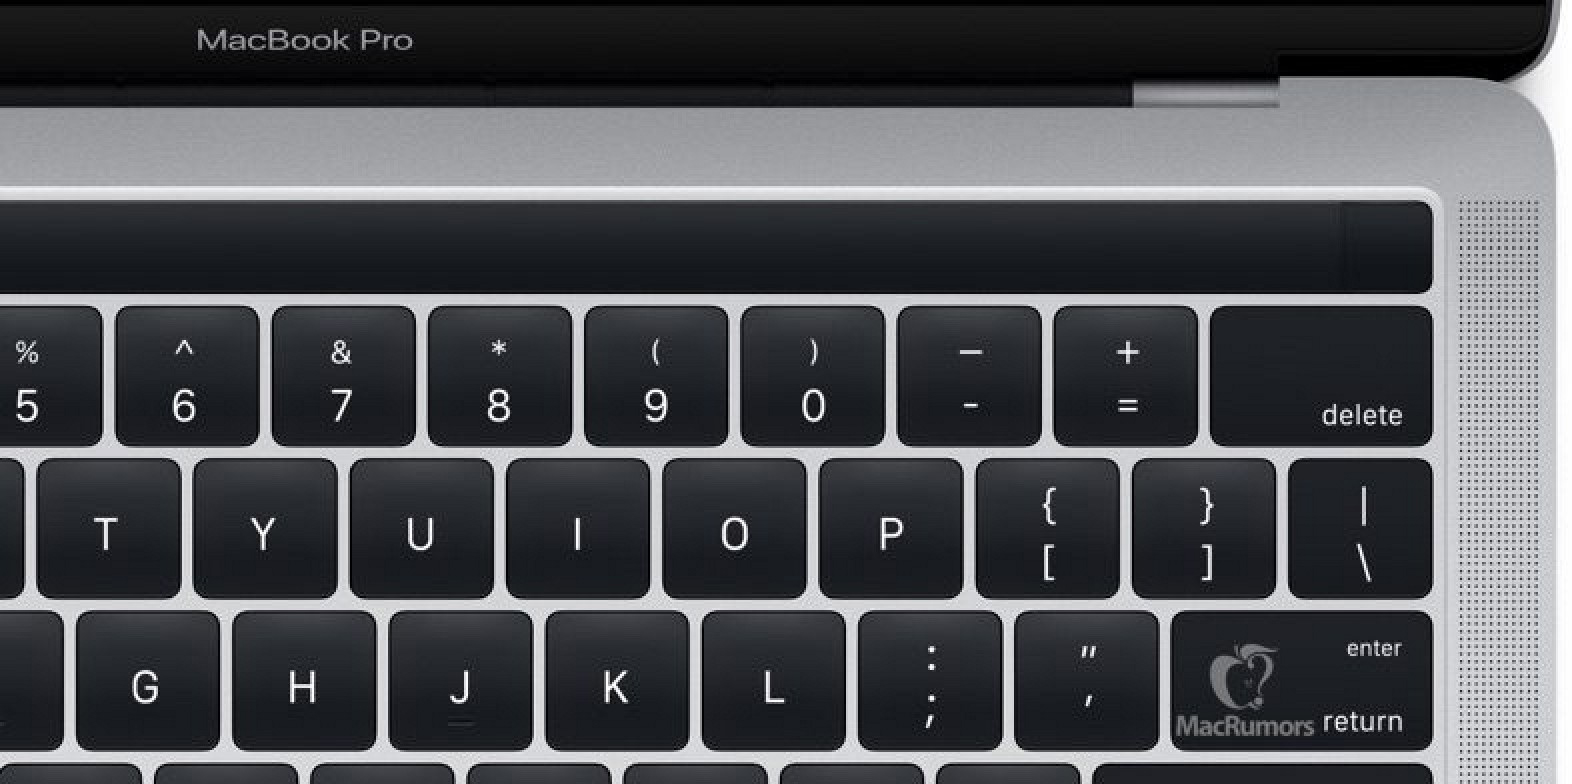 MacBook Pro 马上来了,跟之前透露出来的消息长得差不多